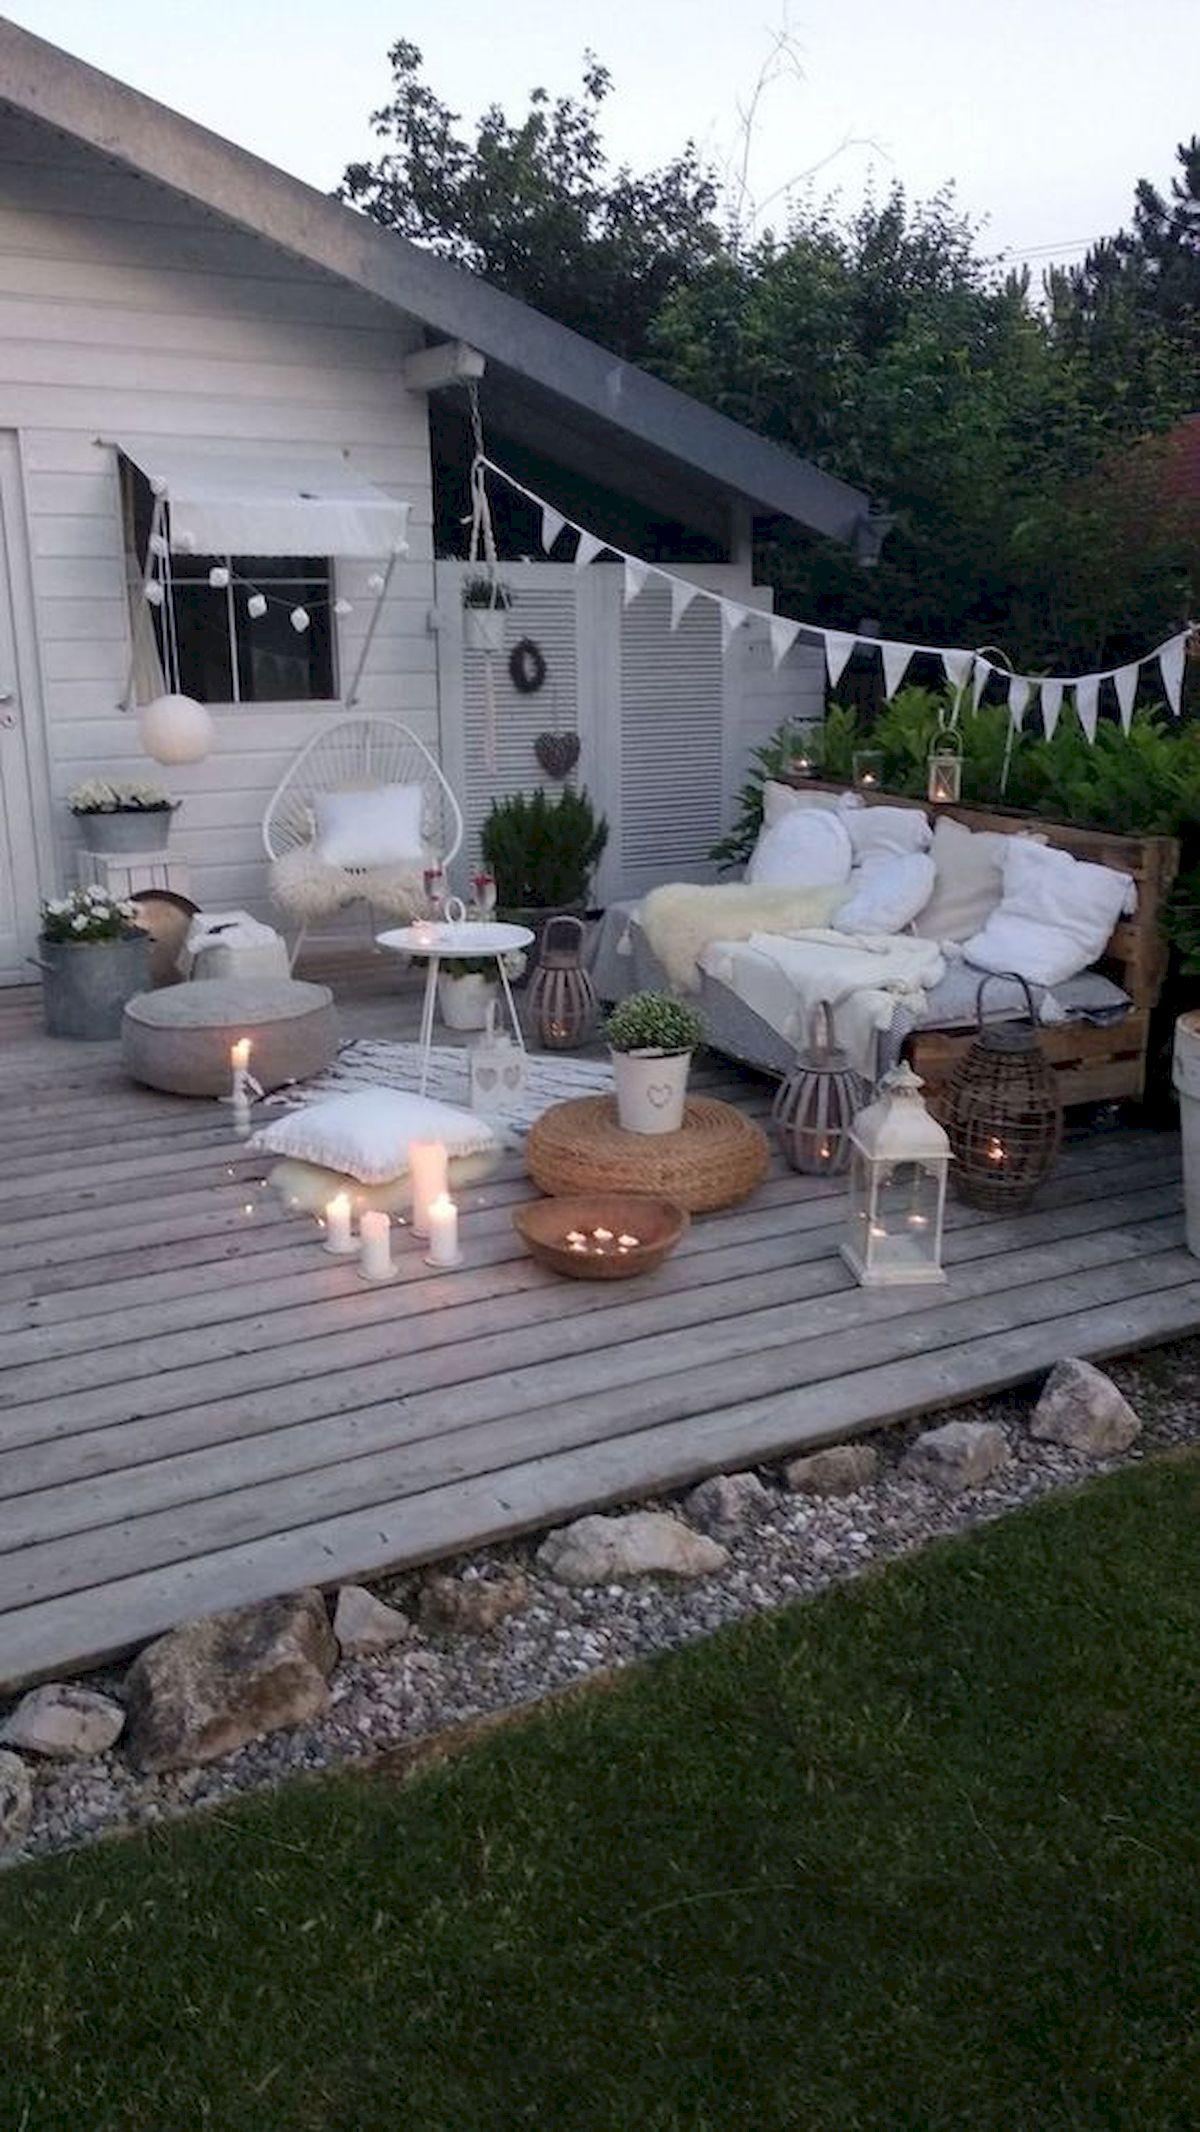 50 Best DIY Backyard Patio And Decking Design Ideas (43)